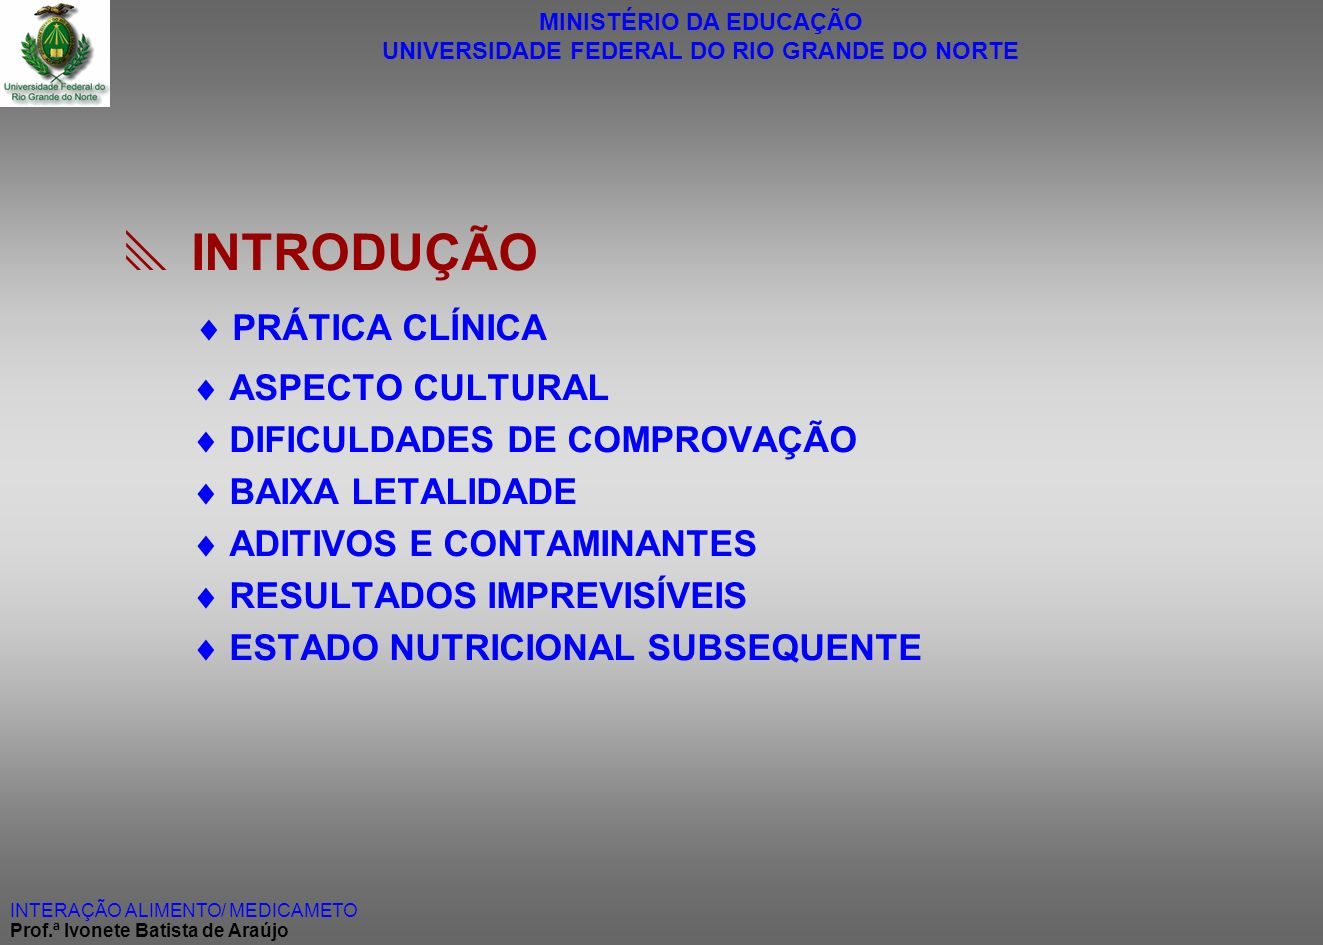  INTRODUÇÃO  PRÁTICA CLÍNICA  ASPECTO CULTURAL